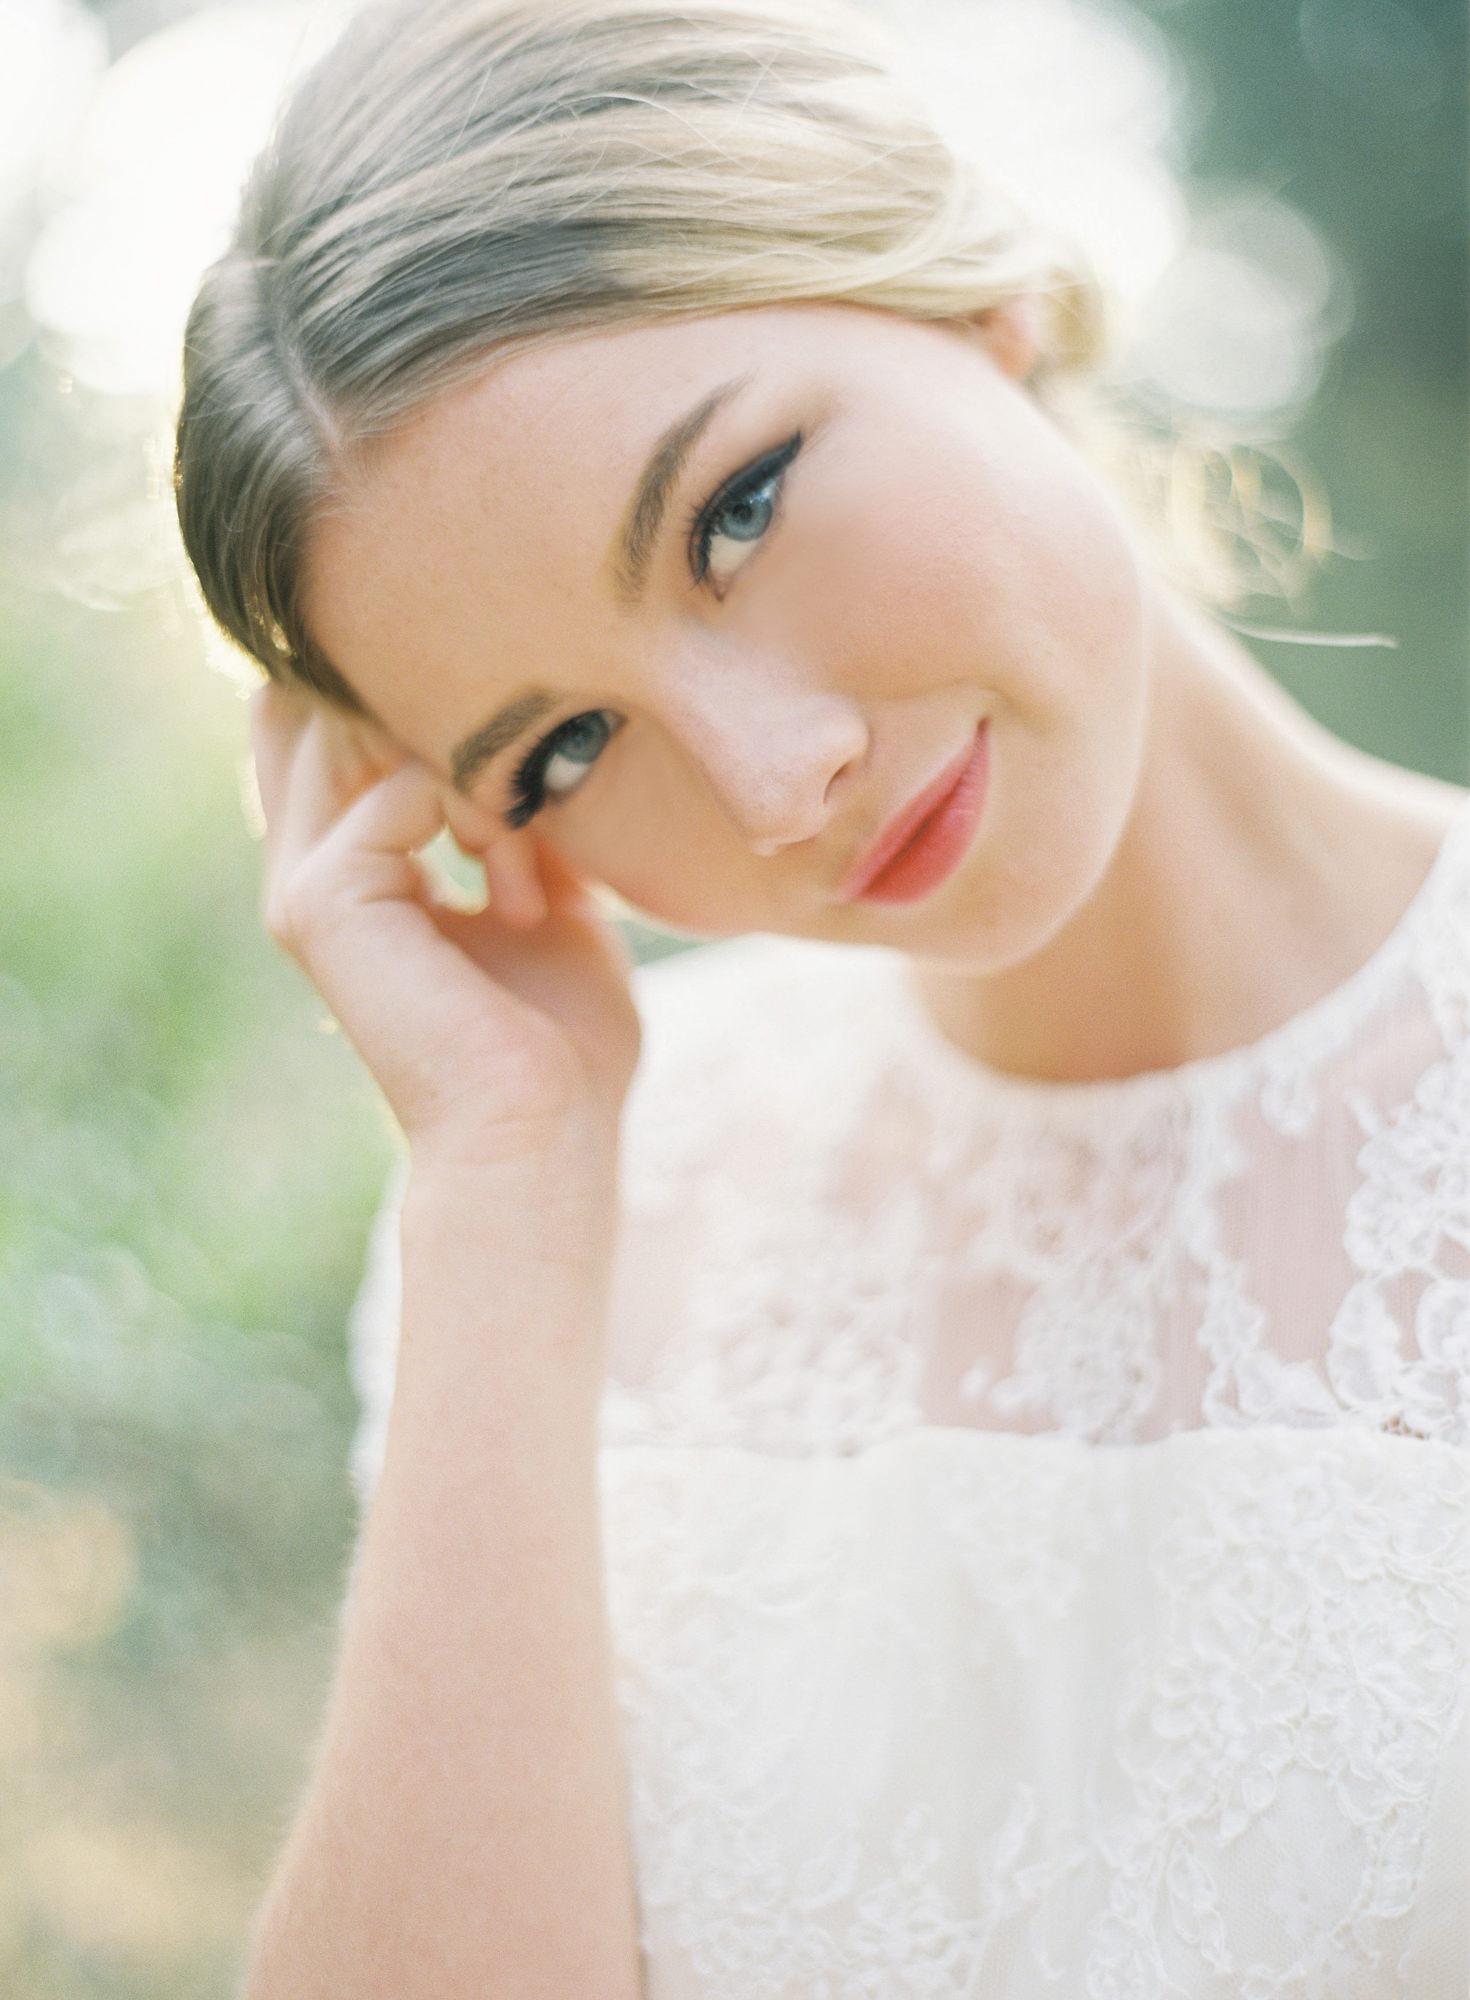 film bridal portrait blonde bride lace collar wedding dress Jen Huang Los Angeles wedding photographer